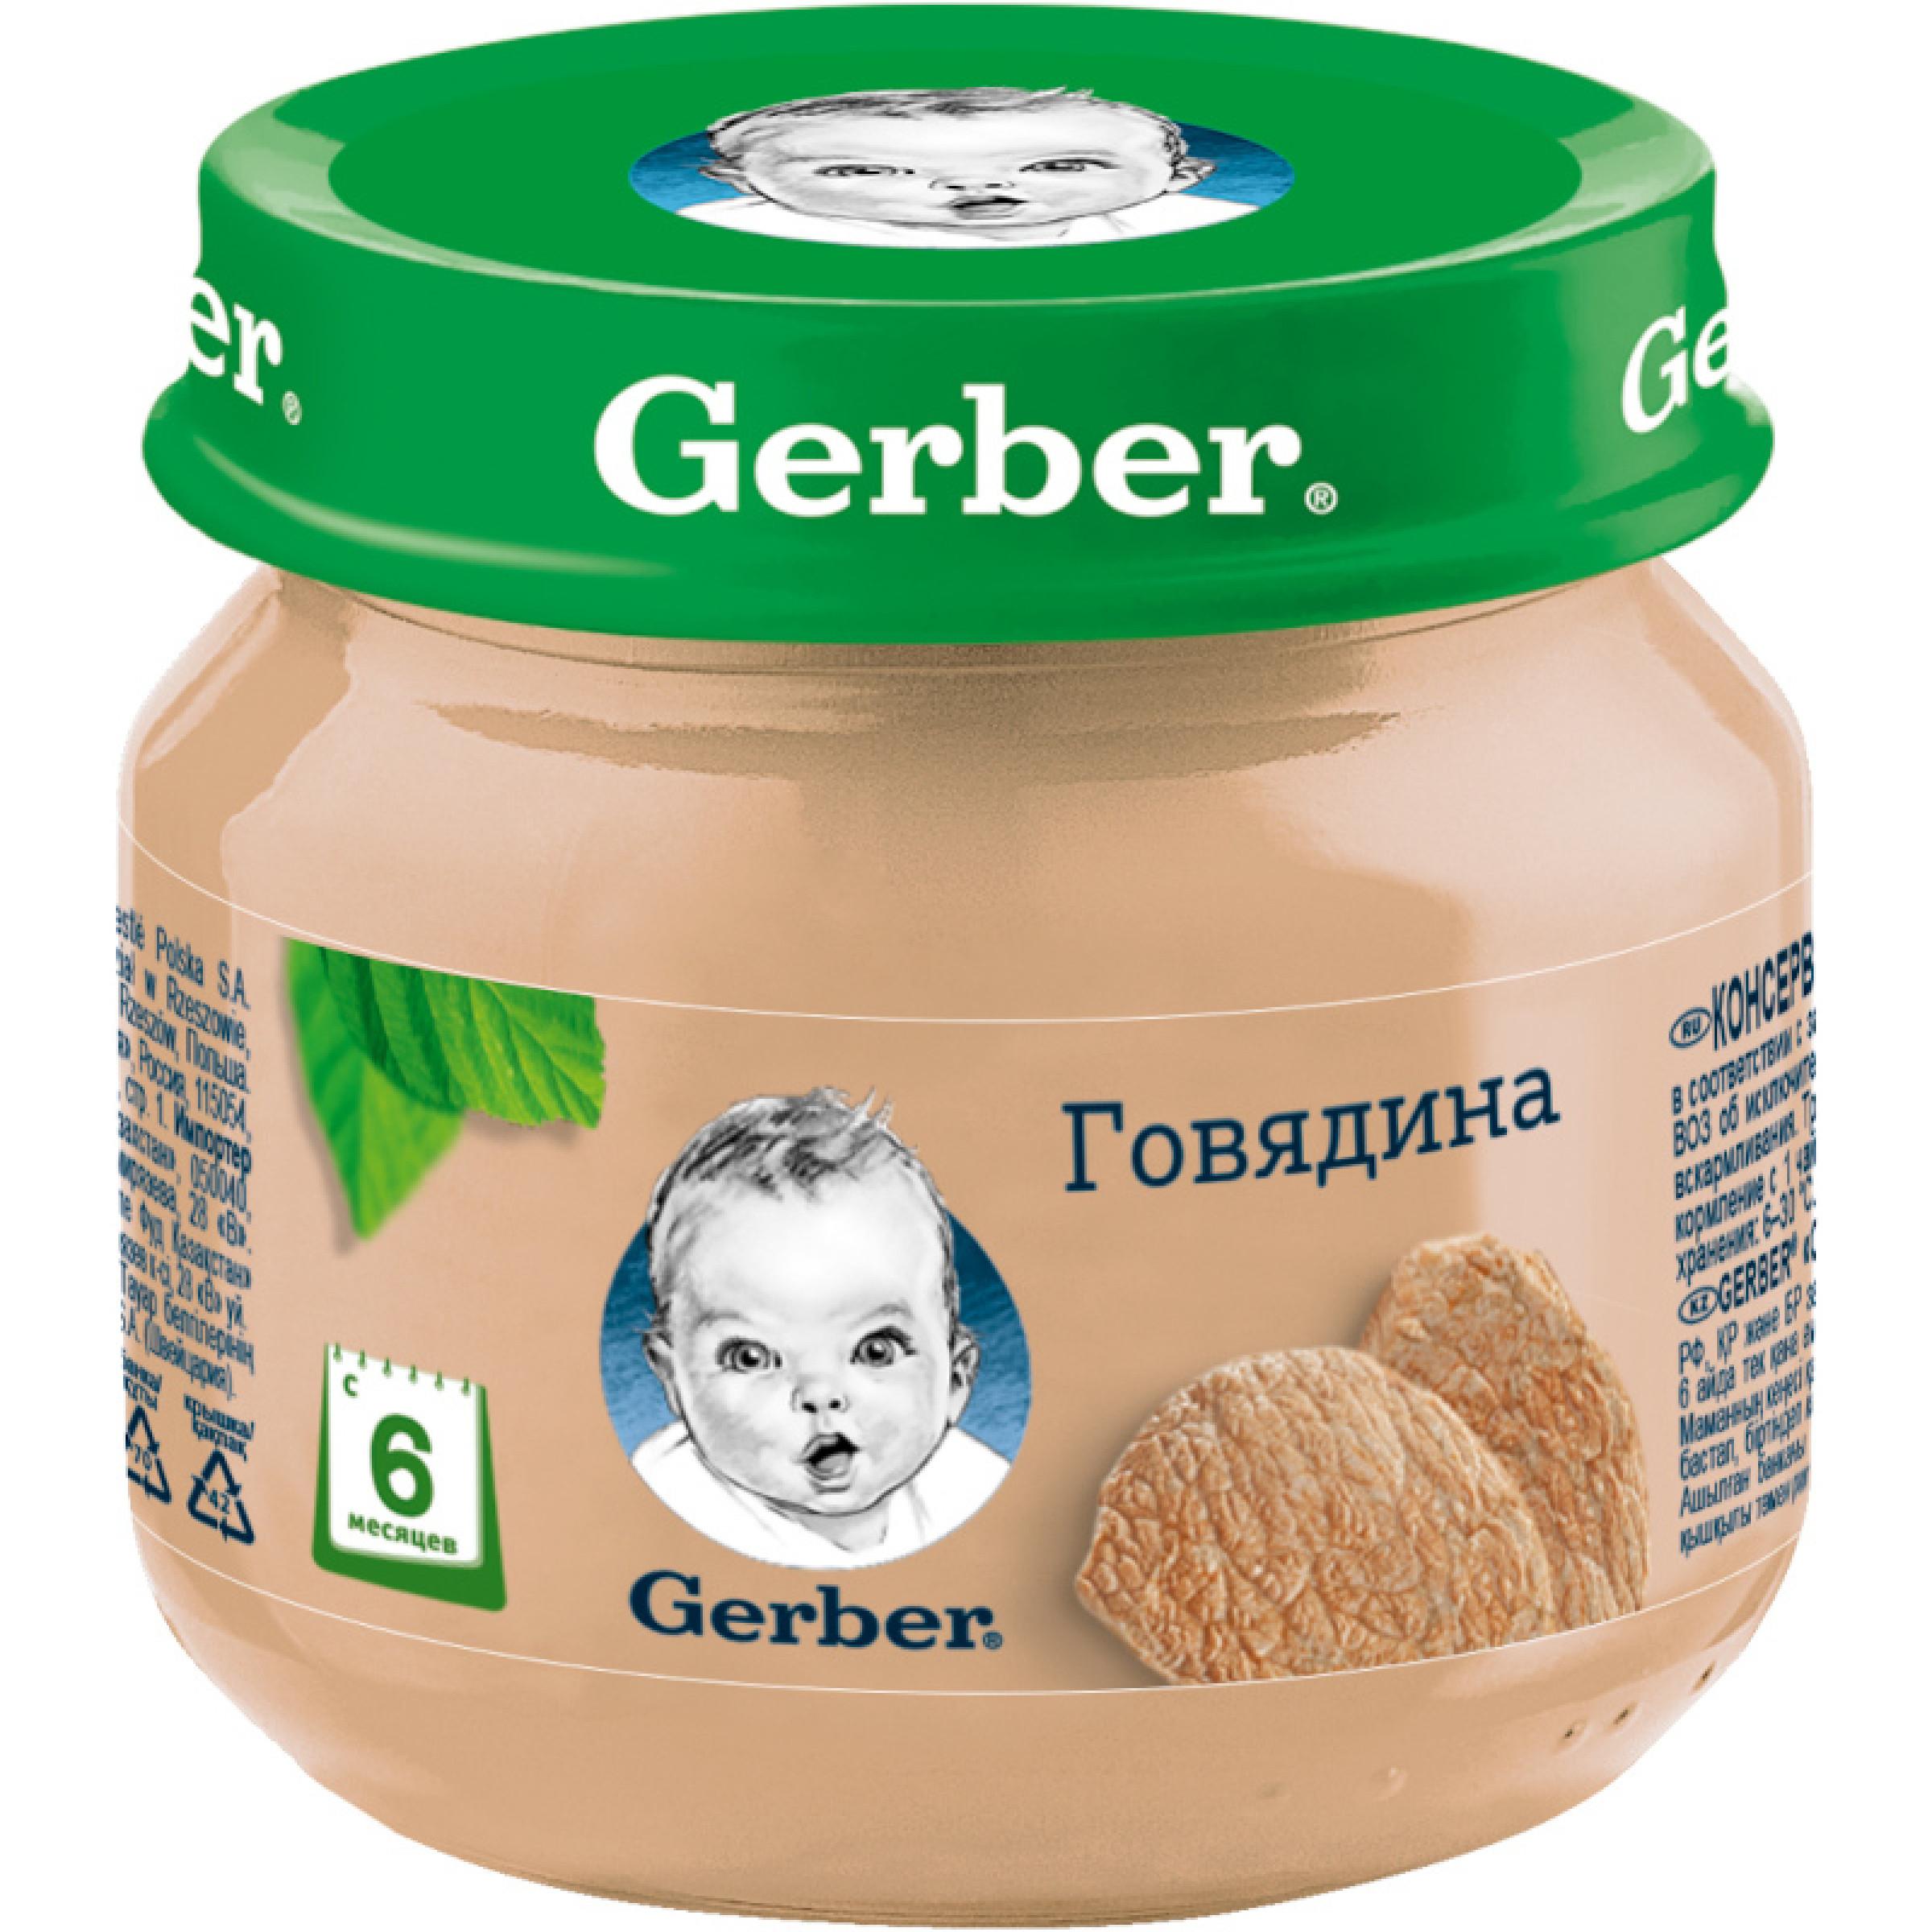 Пюре Gerber Говядина, 80 г